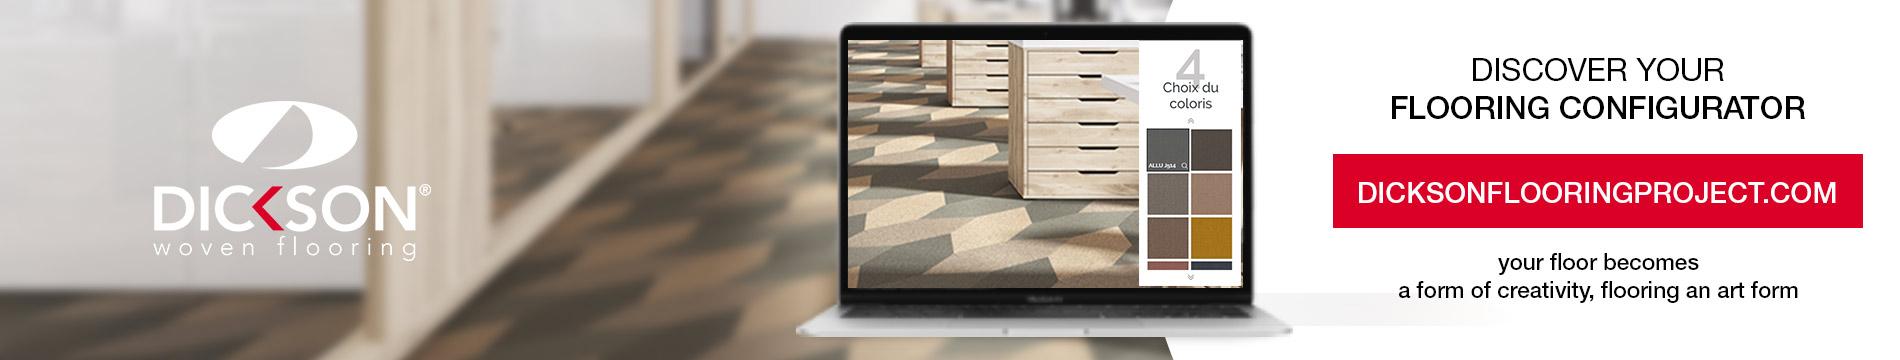 Dickson® Flooring Project